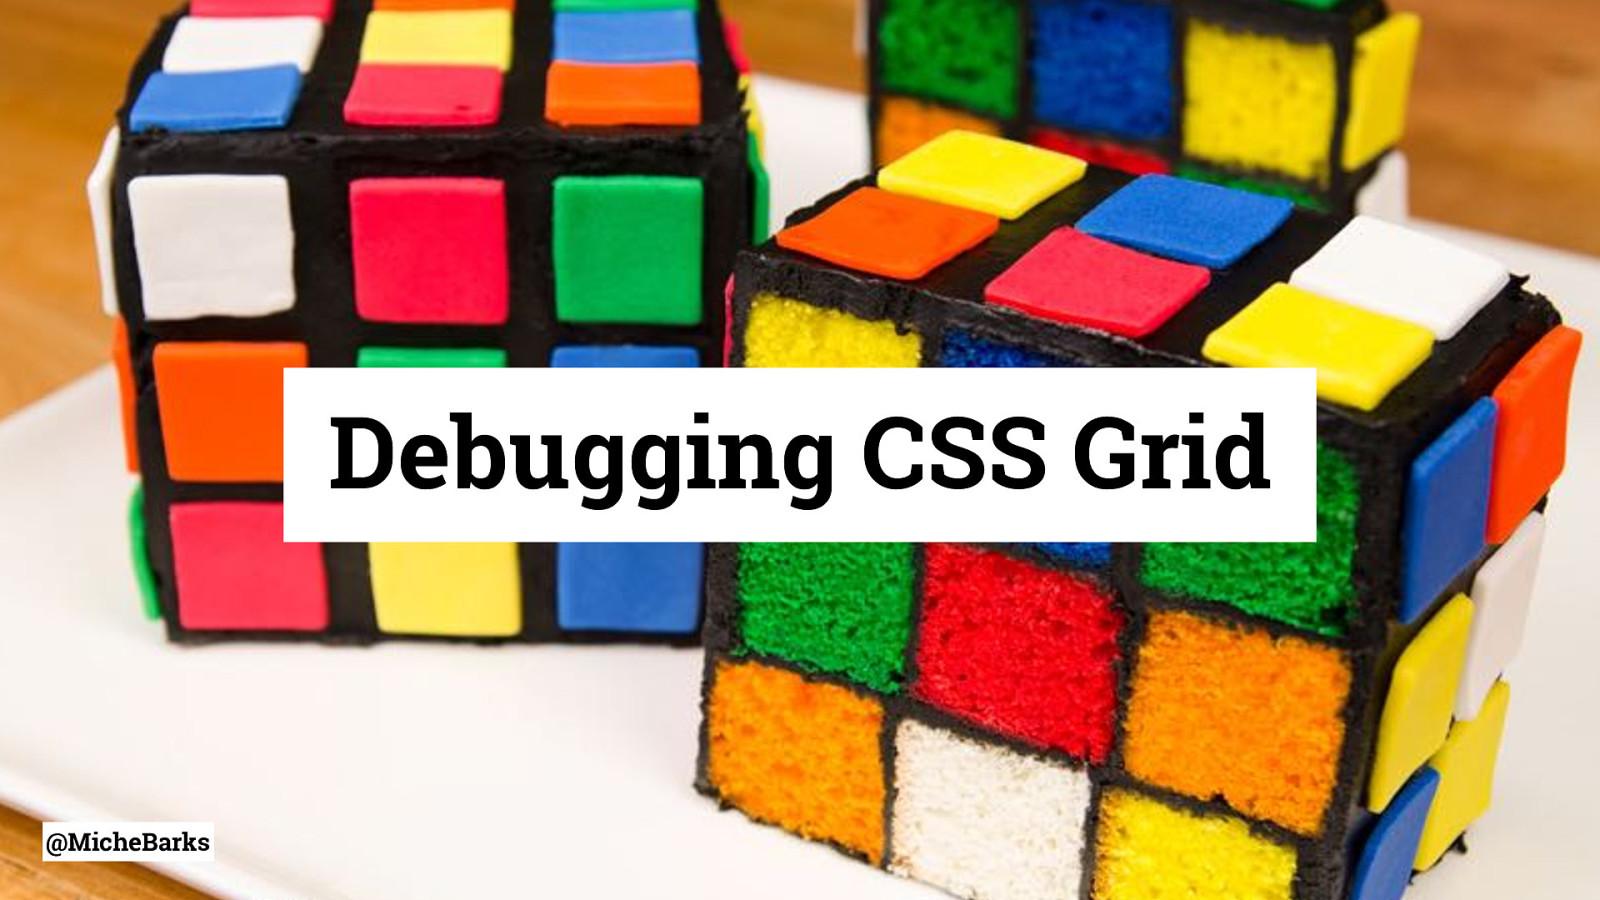 Debugging CSS Grid